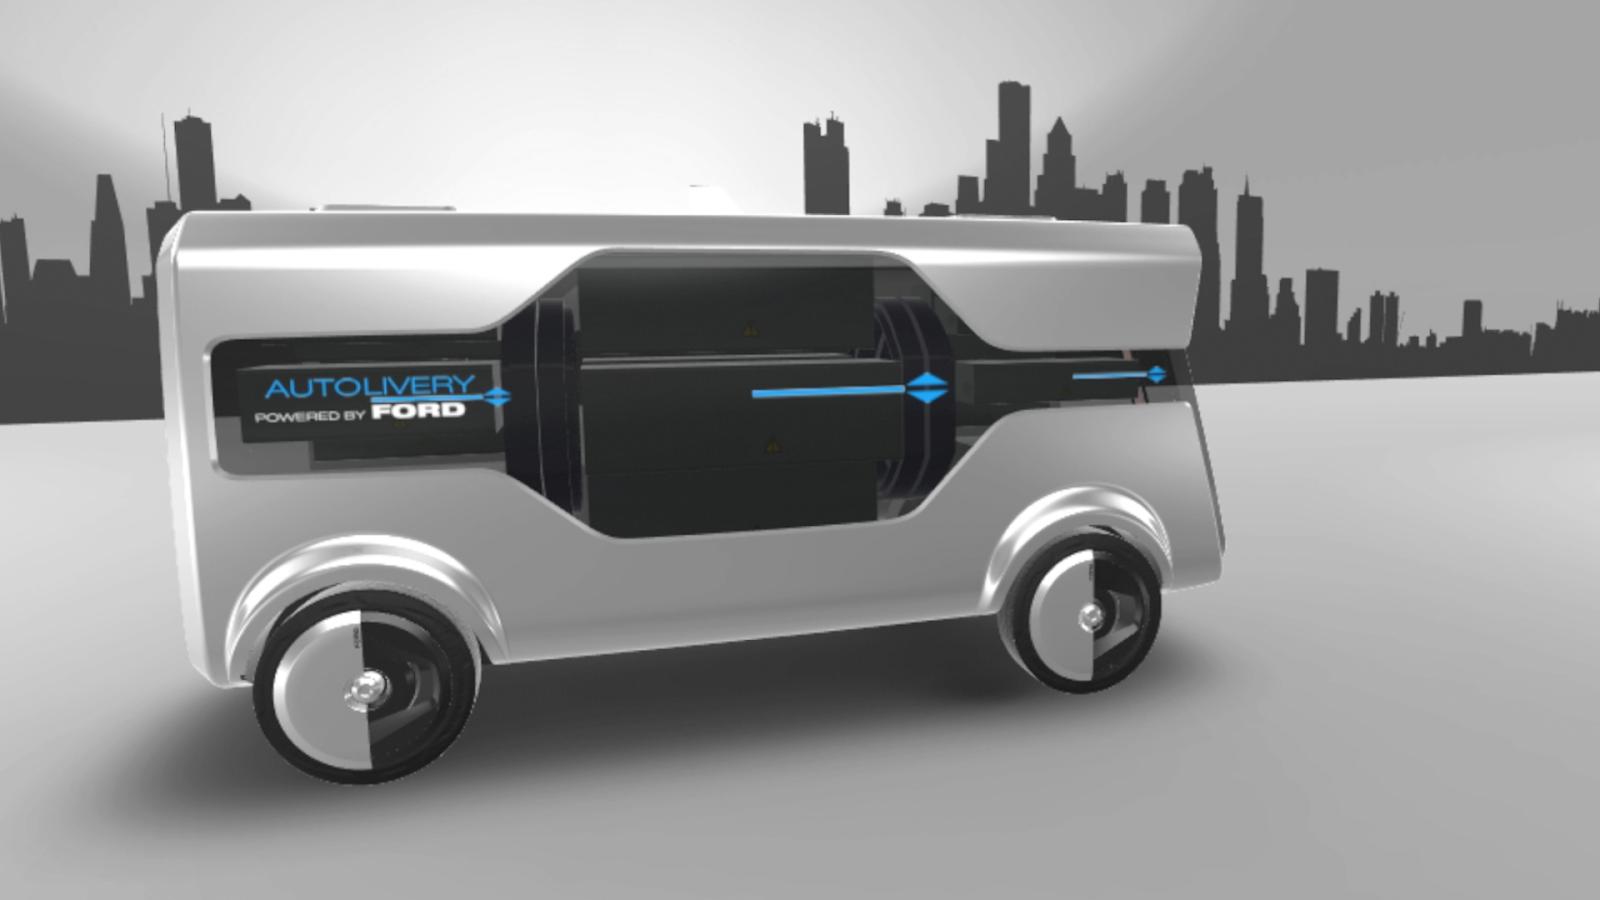 FORD 2017 MWC Autolivery 08 Ford : H πόλη του μέλλοντος θα έχει αυτόνομα van και drone... για delivery